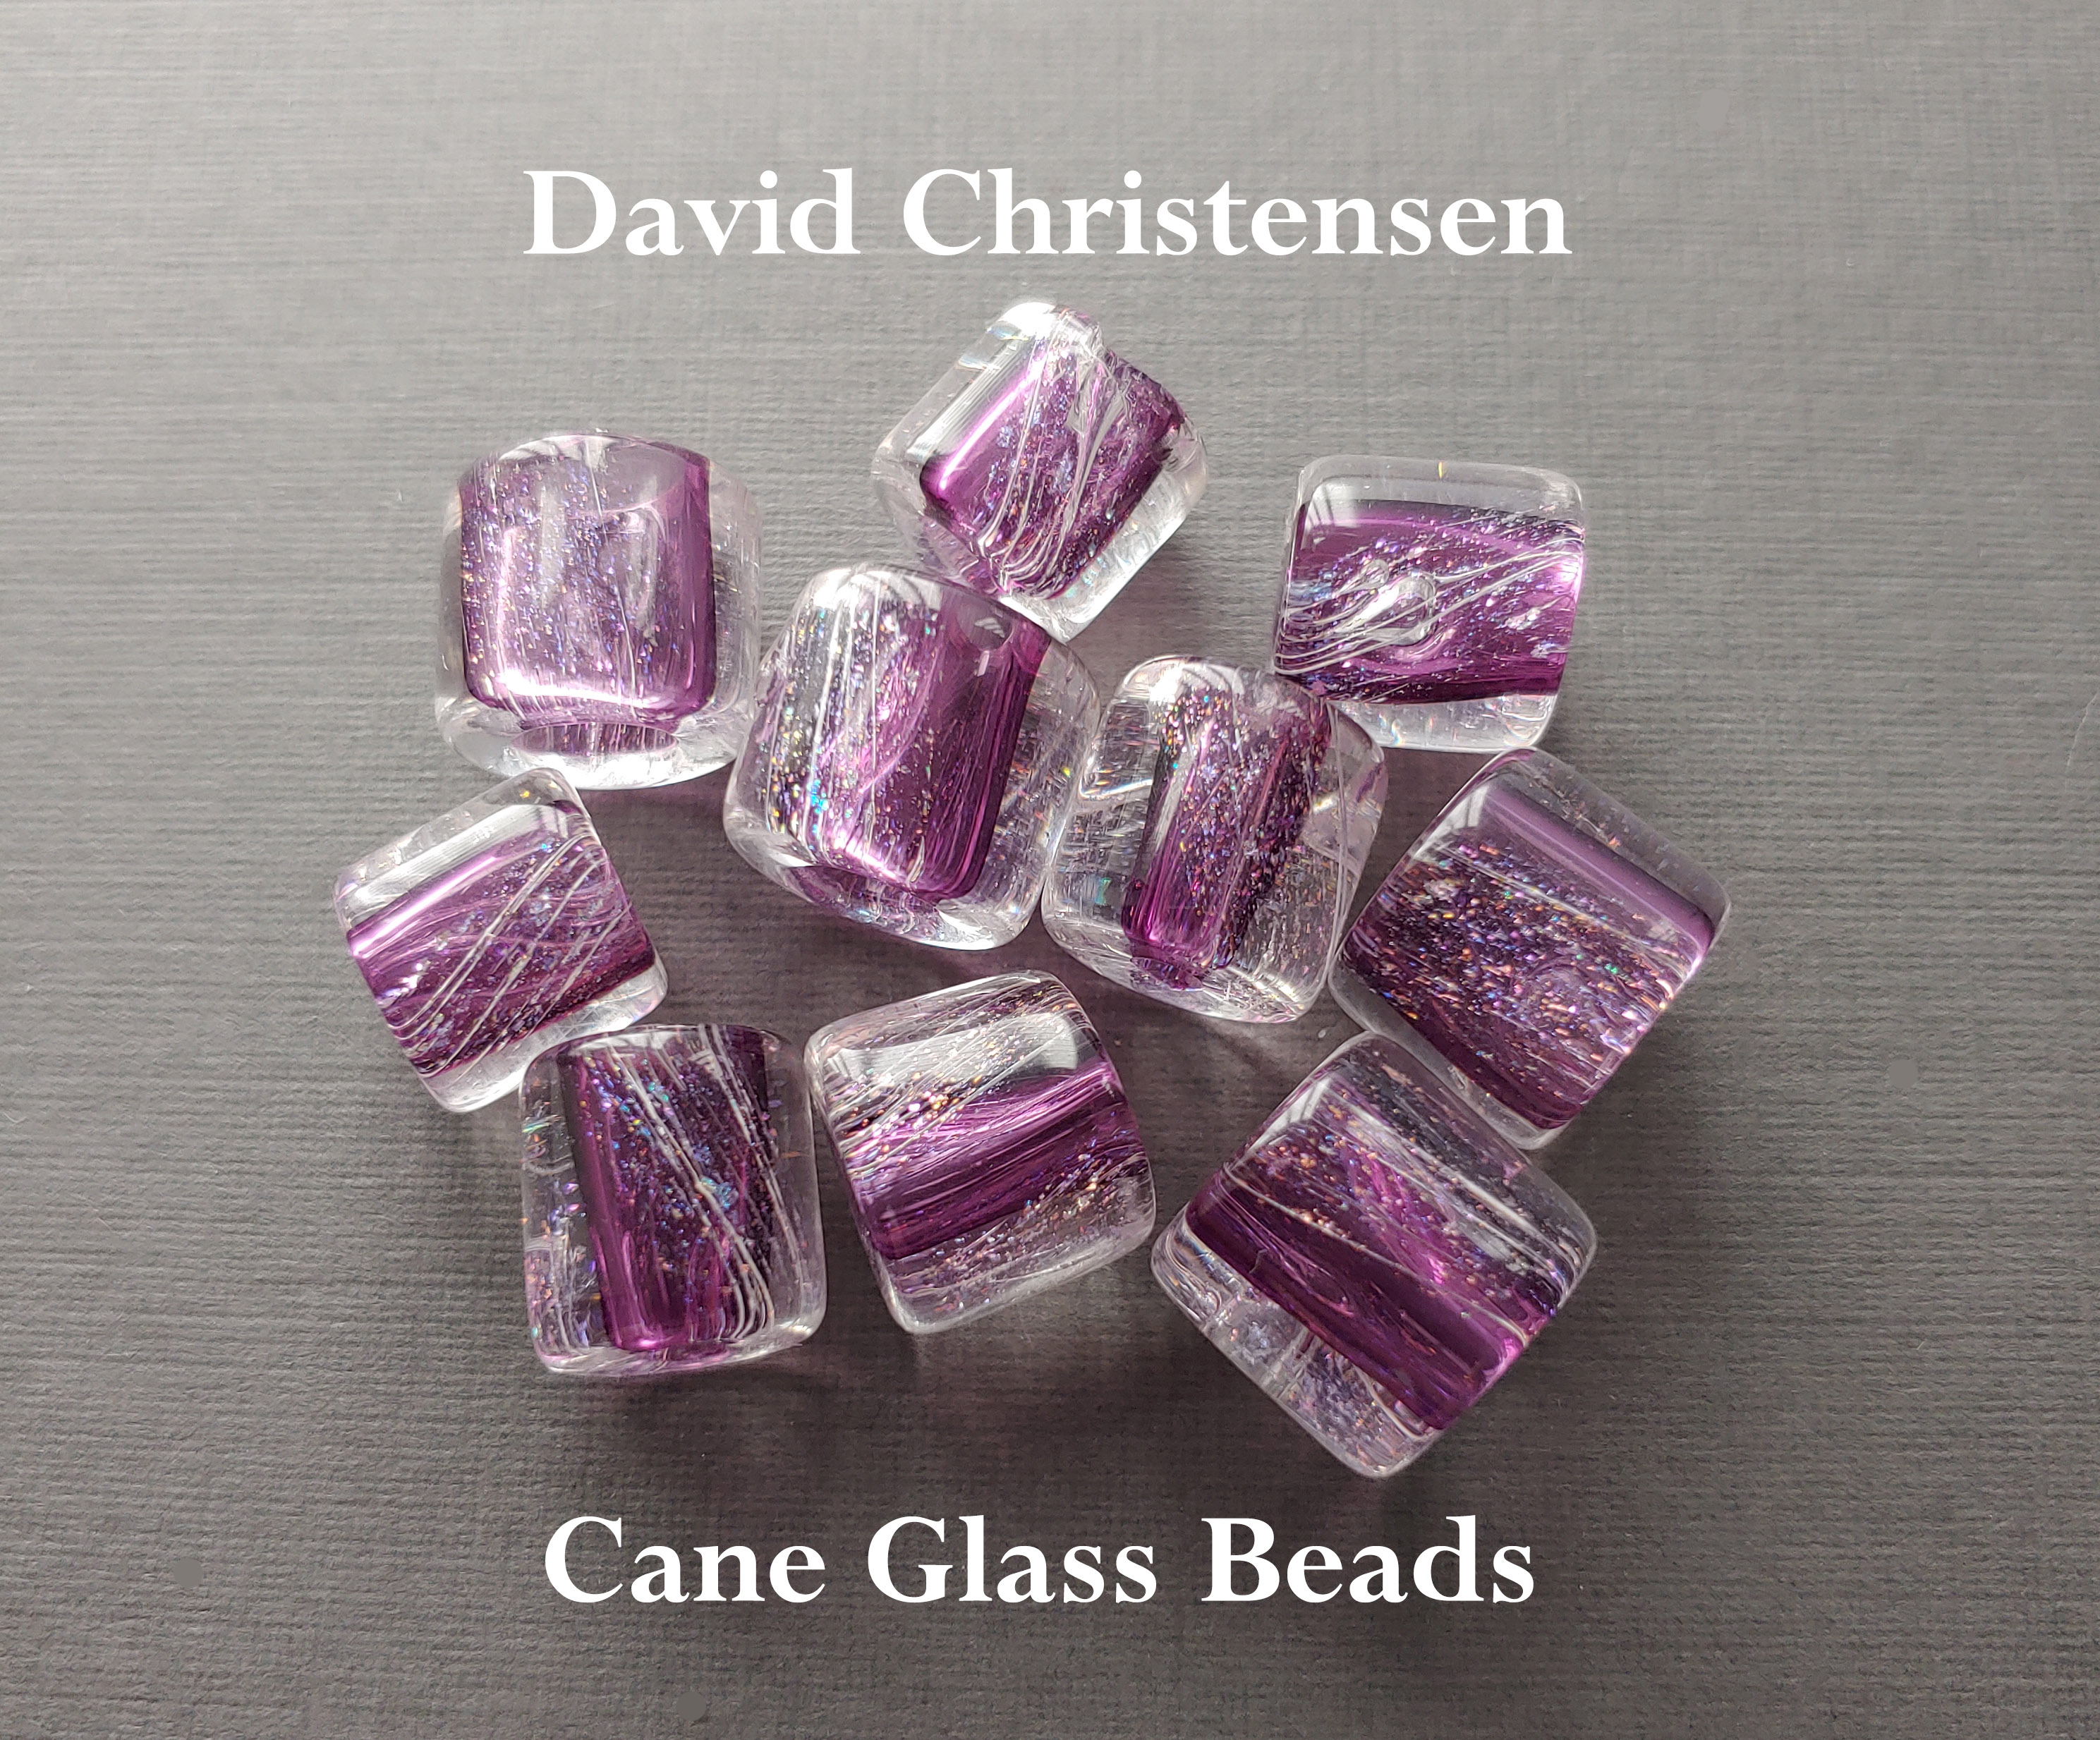 Authentic David Christensen Cane Glass Beads